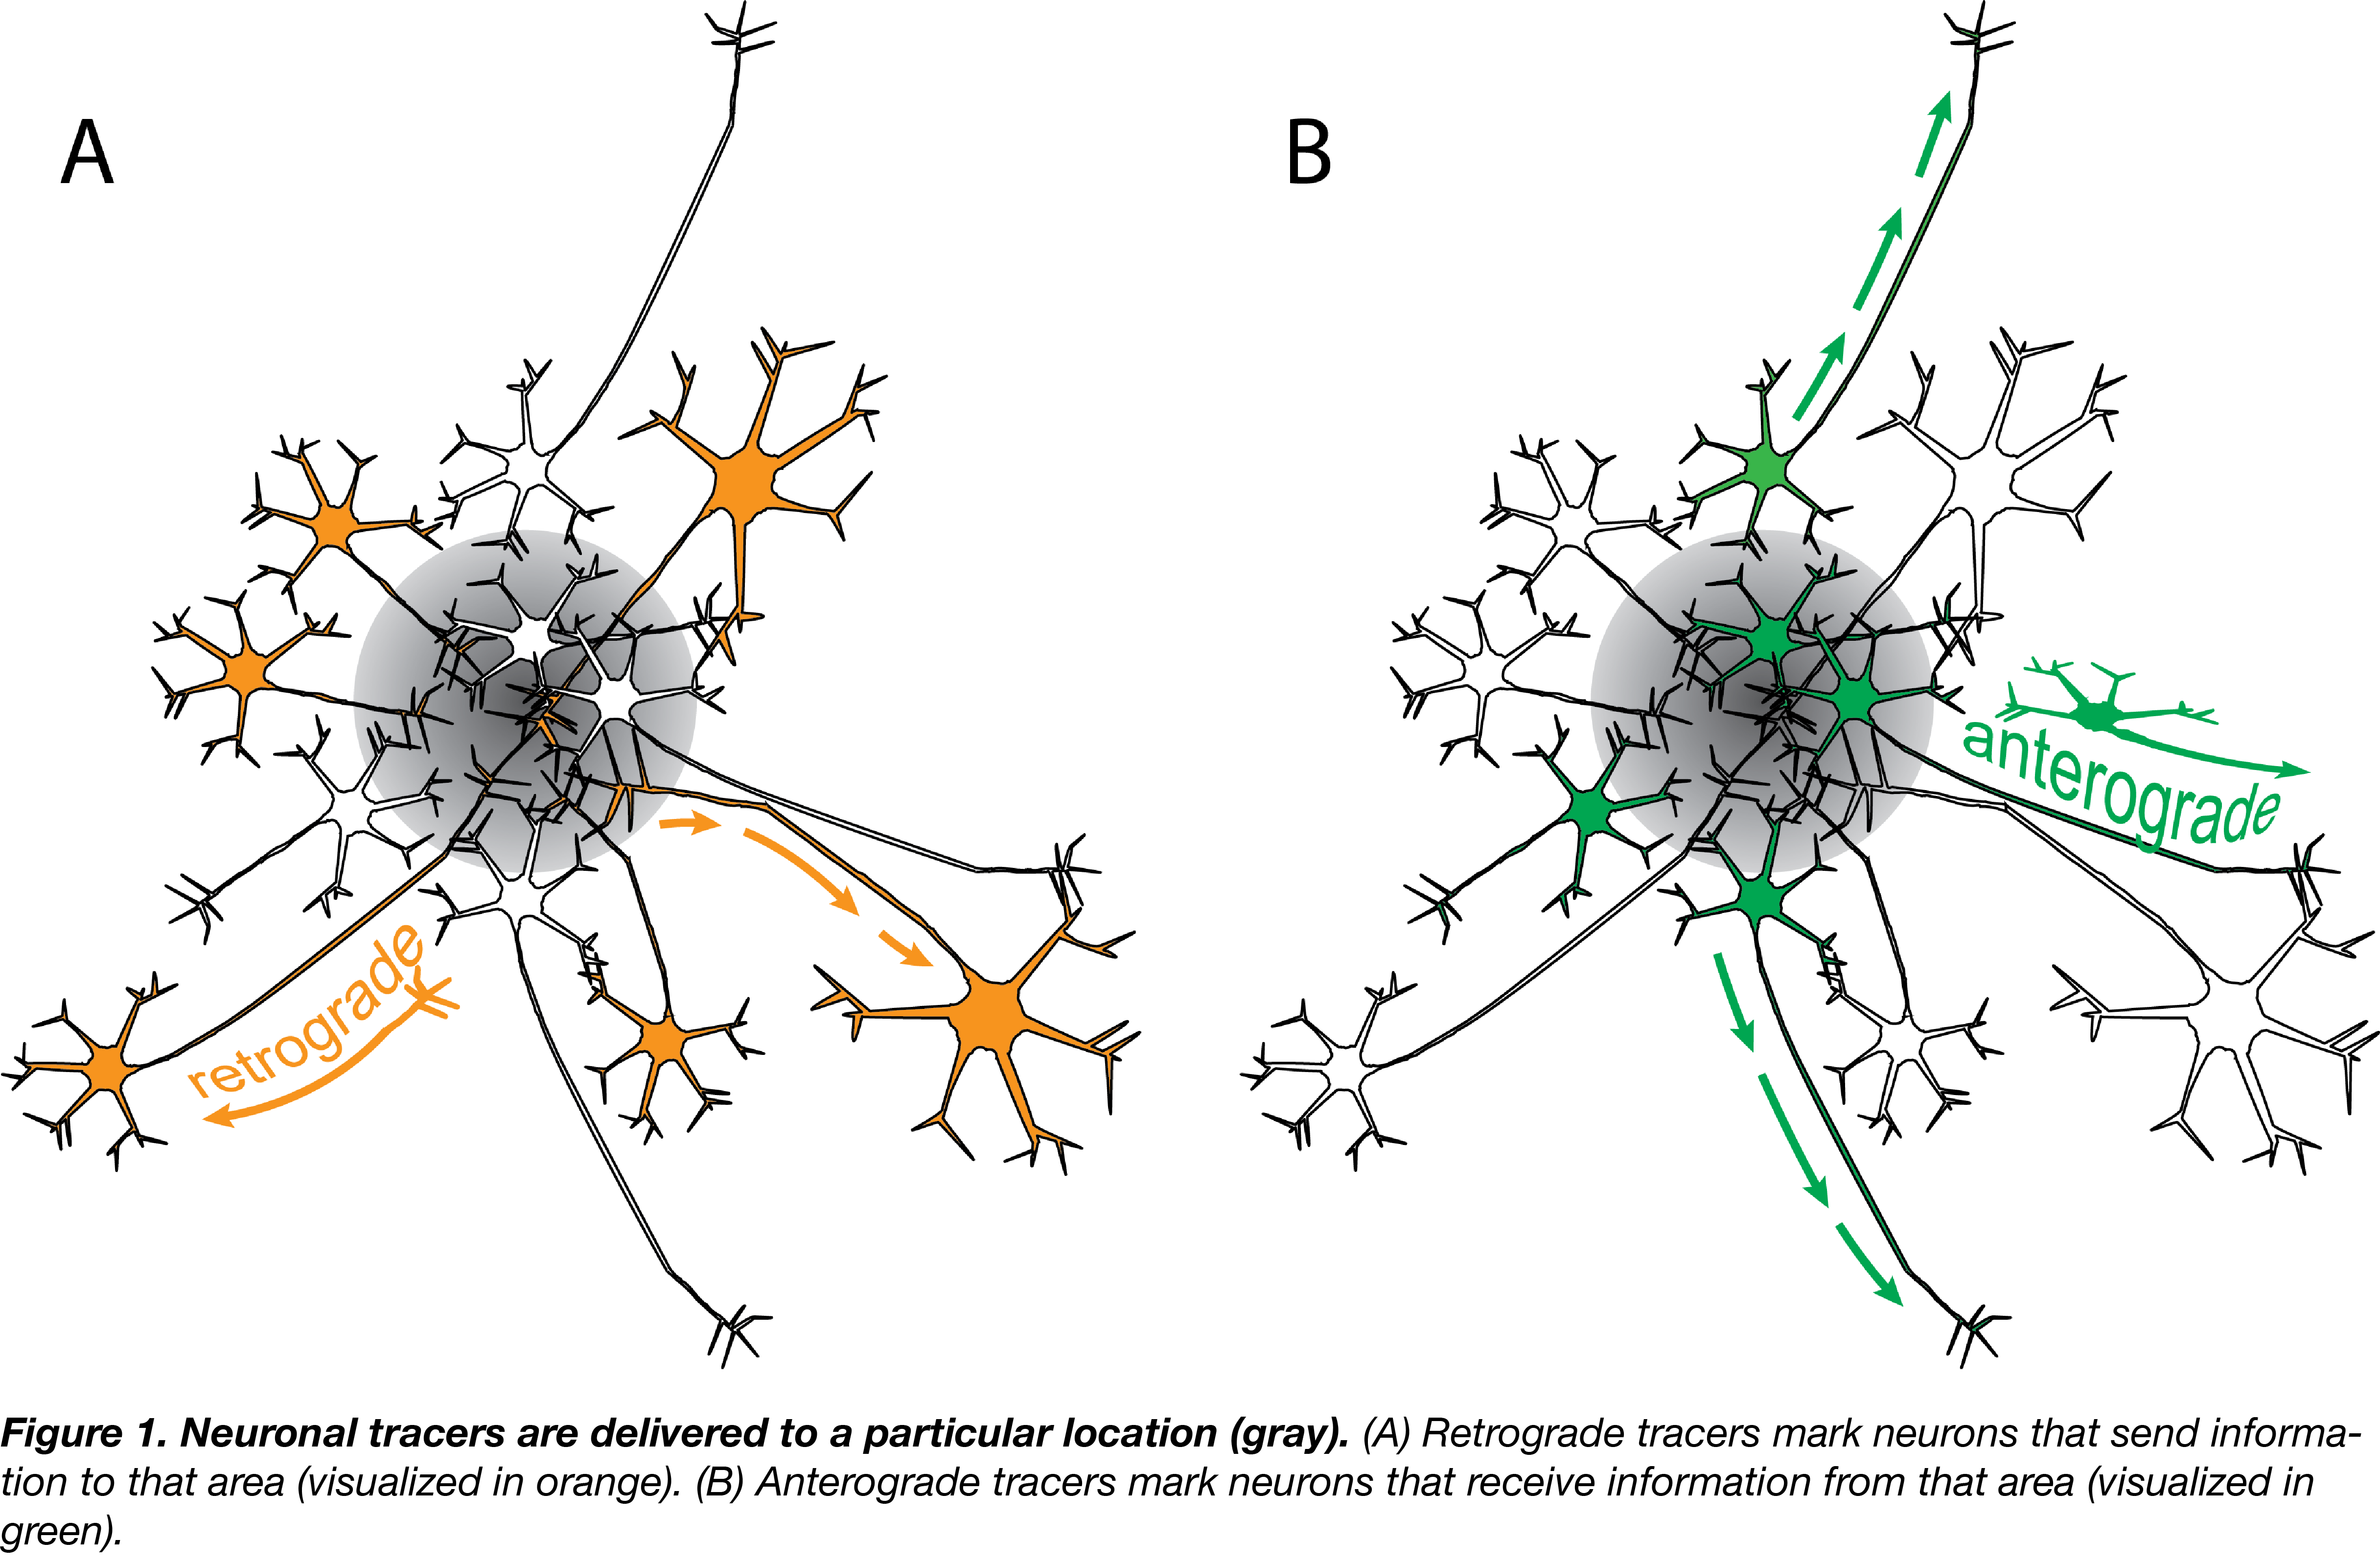 Anterograde and retrograde neuronal tracers